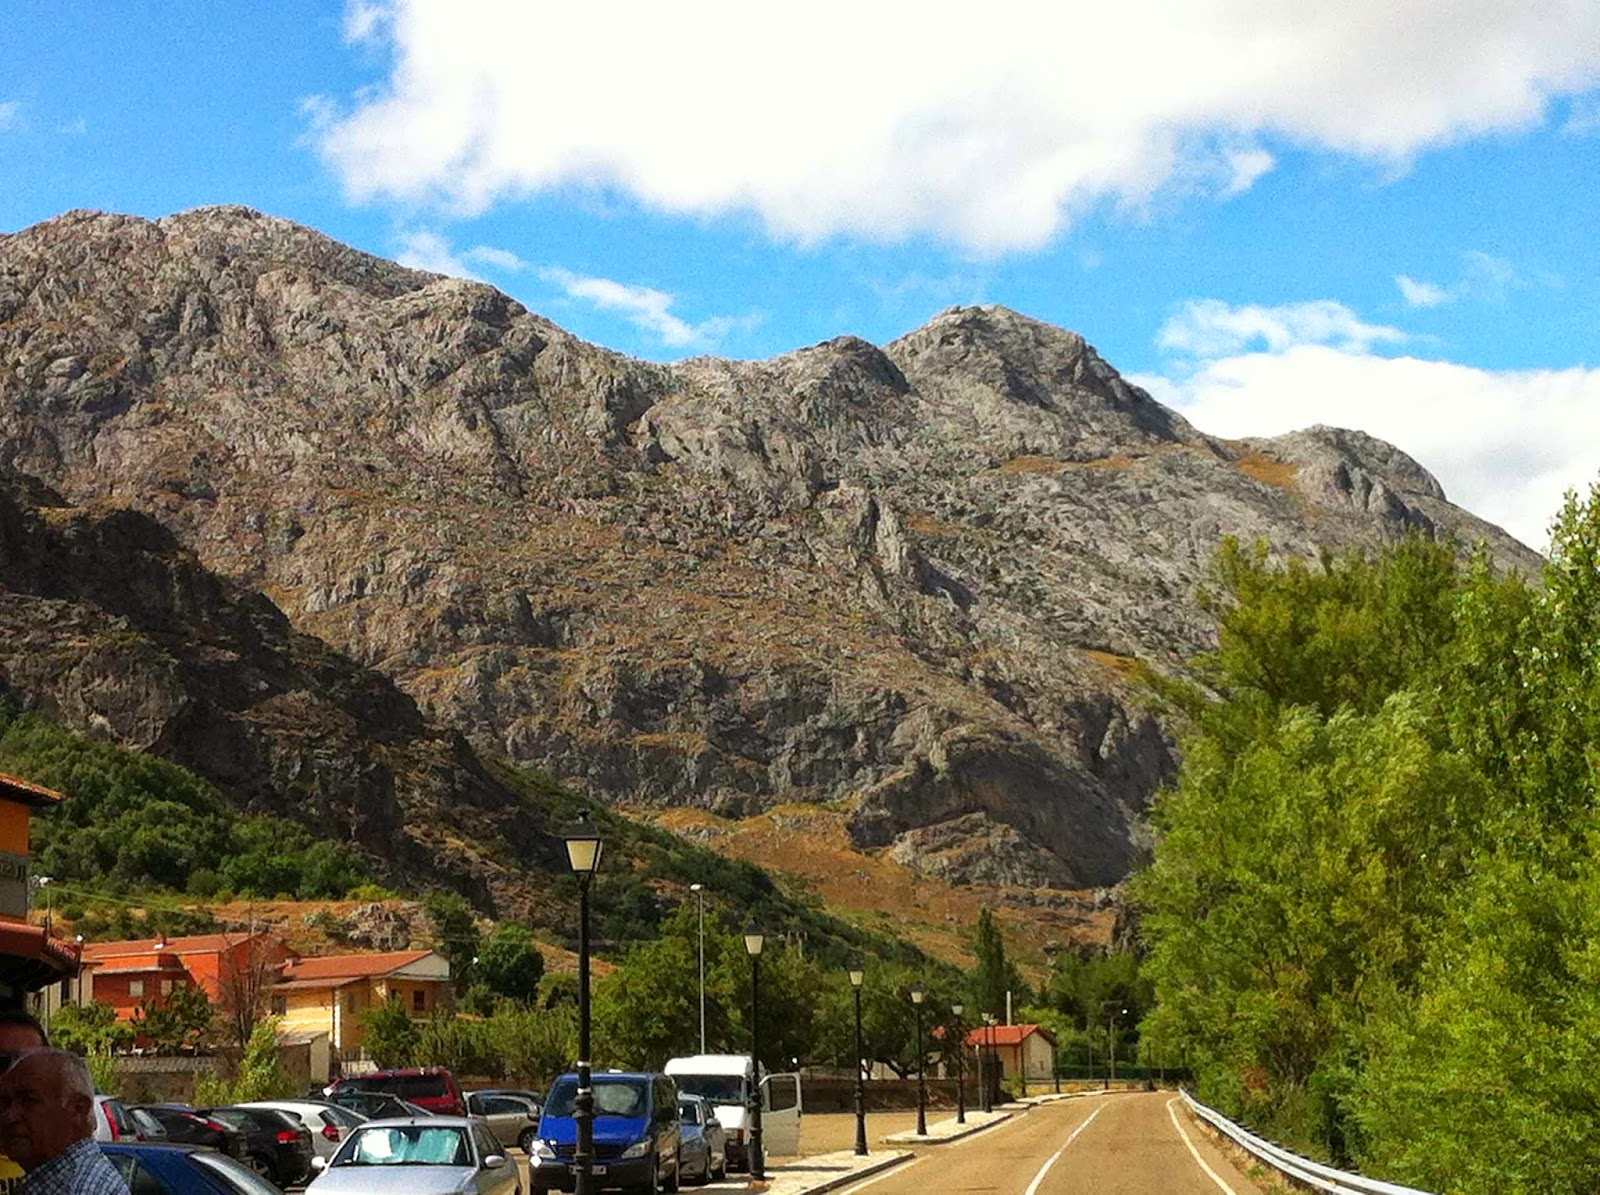 Restaurante-LasRocas-Vegacervera-Leon-Vegacervera-Montaña